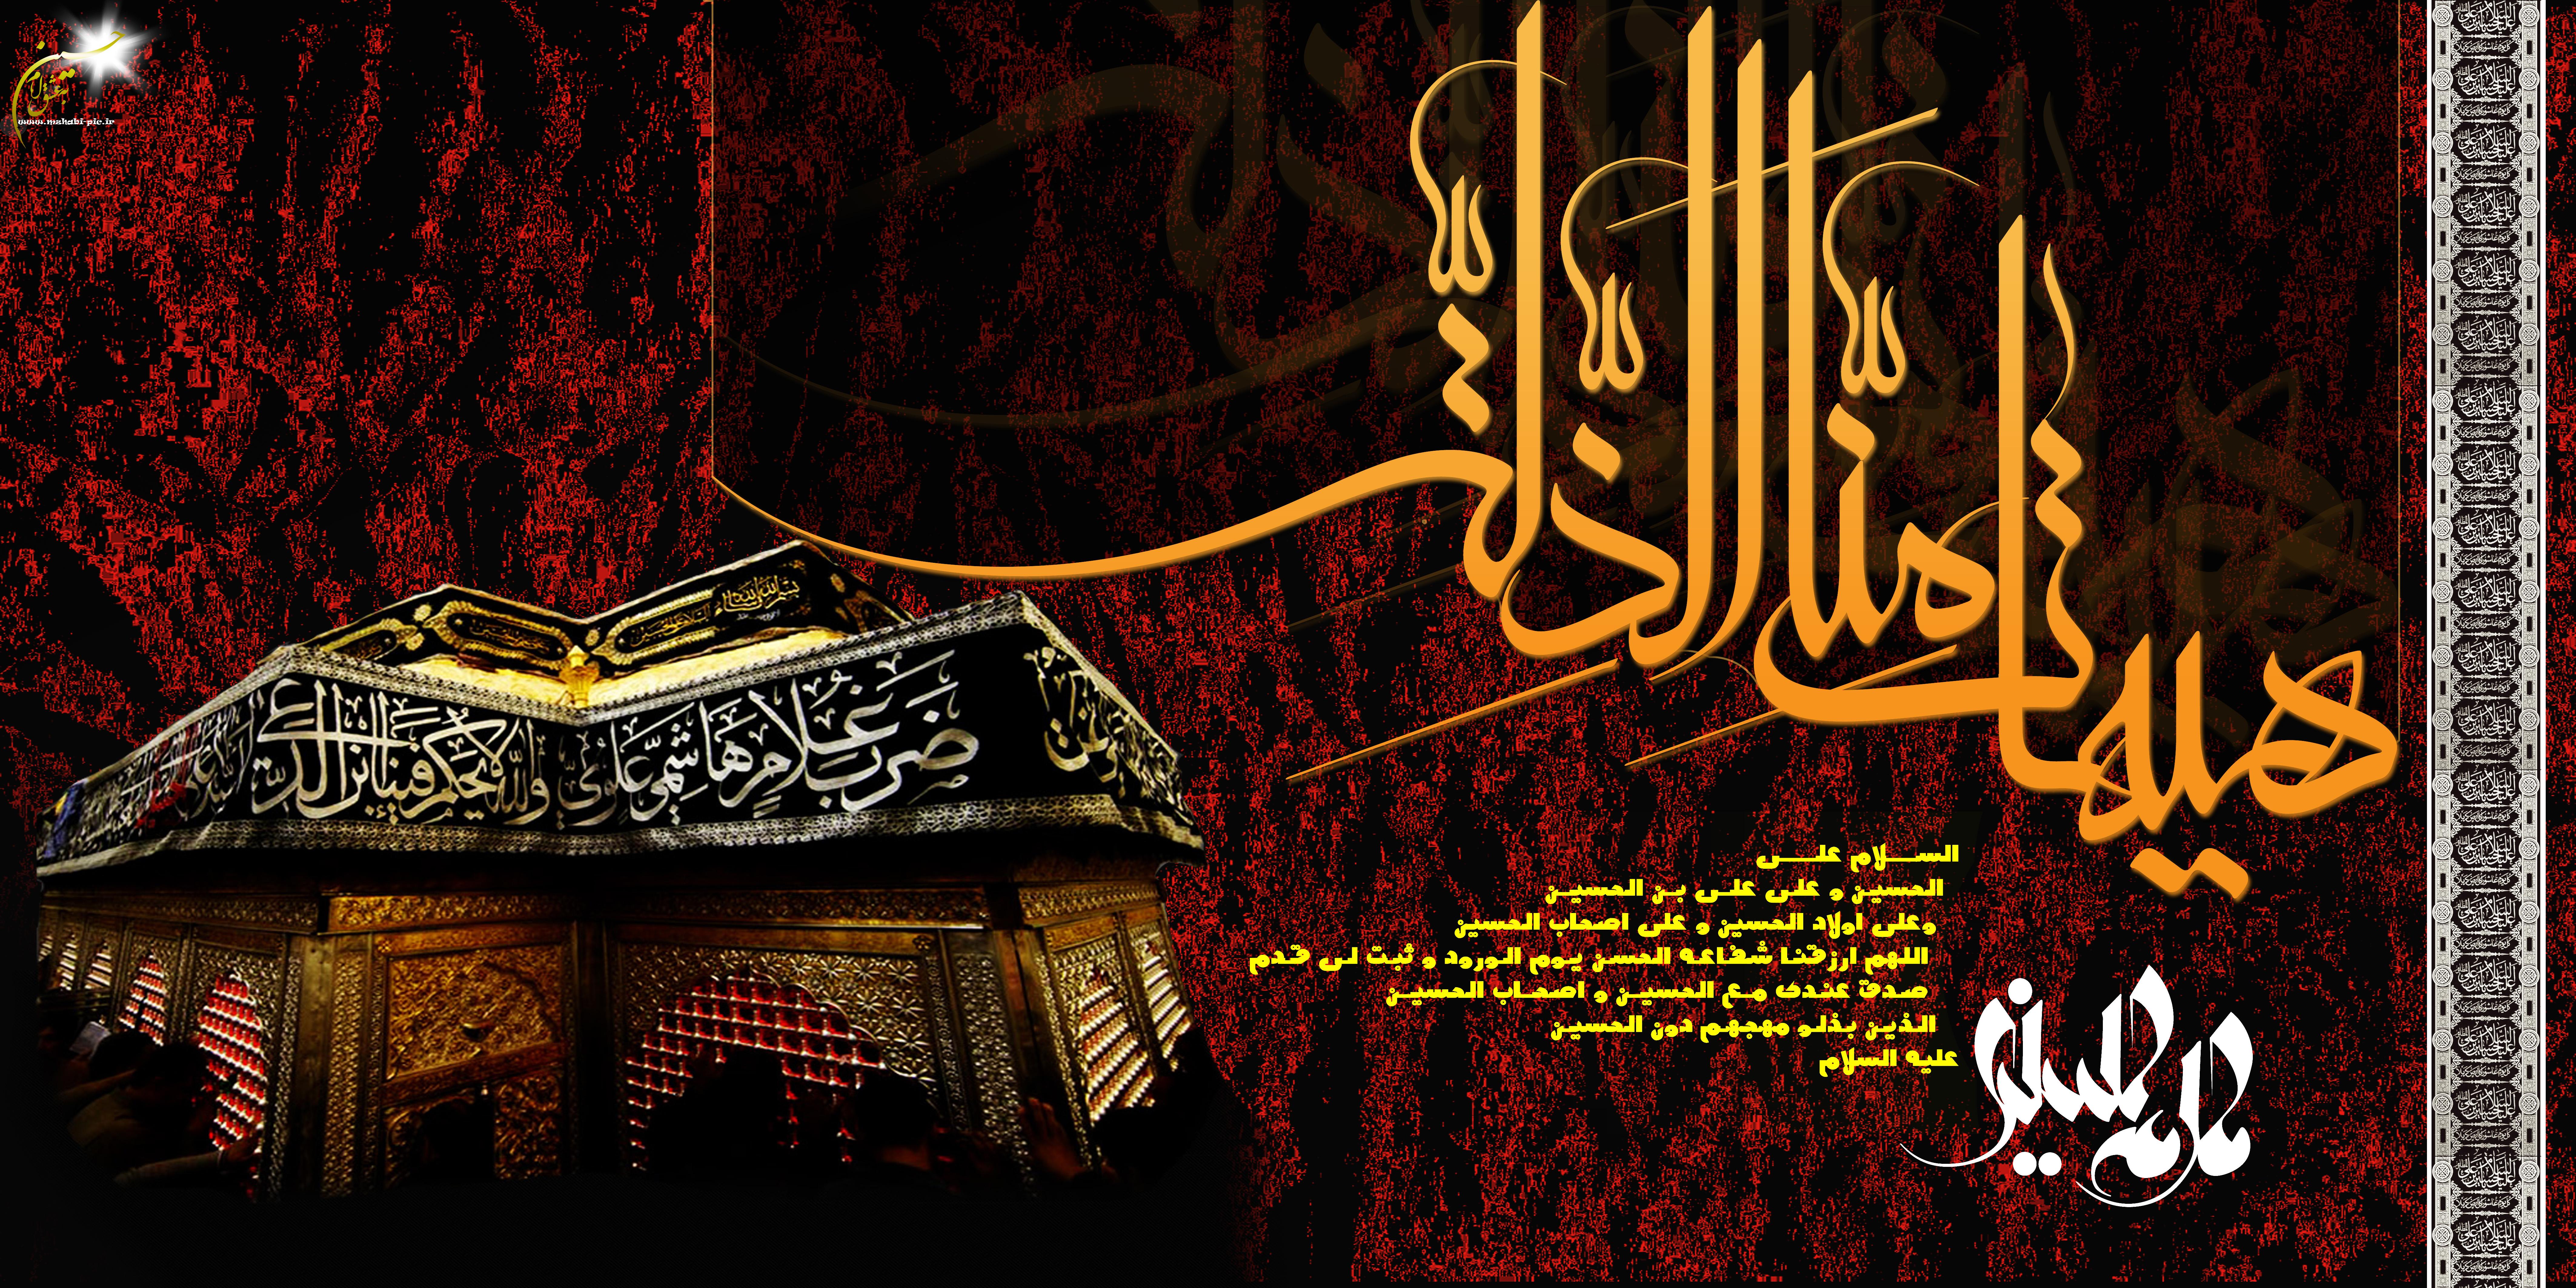 http://mzhabi-pic2.persiangig.com/tarh%20-baner-mohrram-89-4.jpg